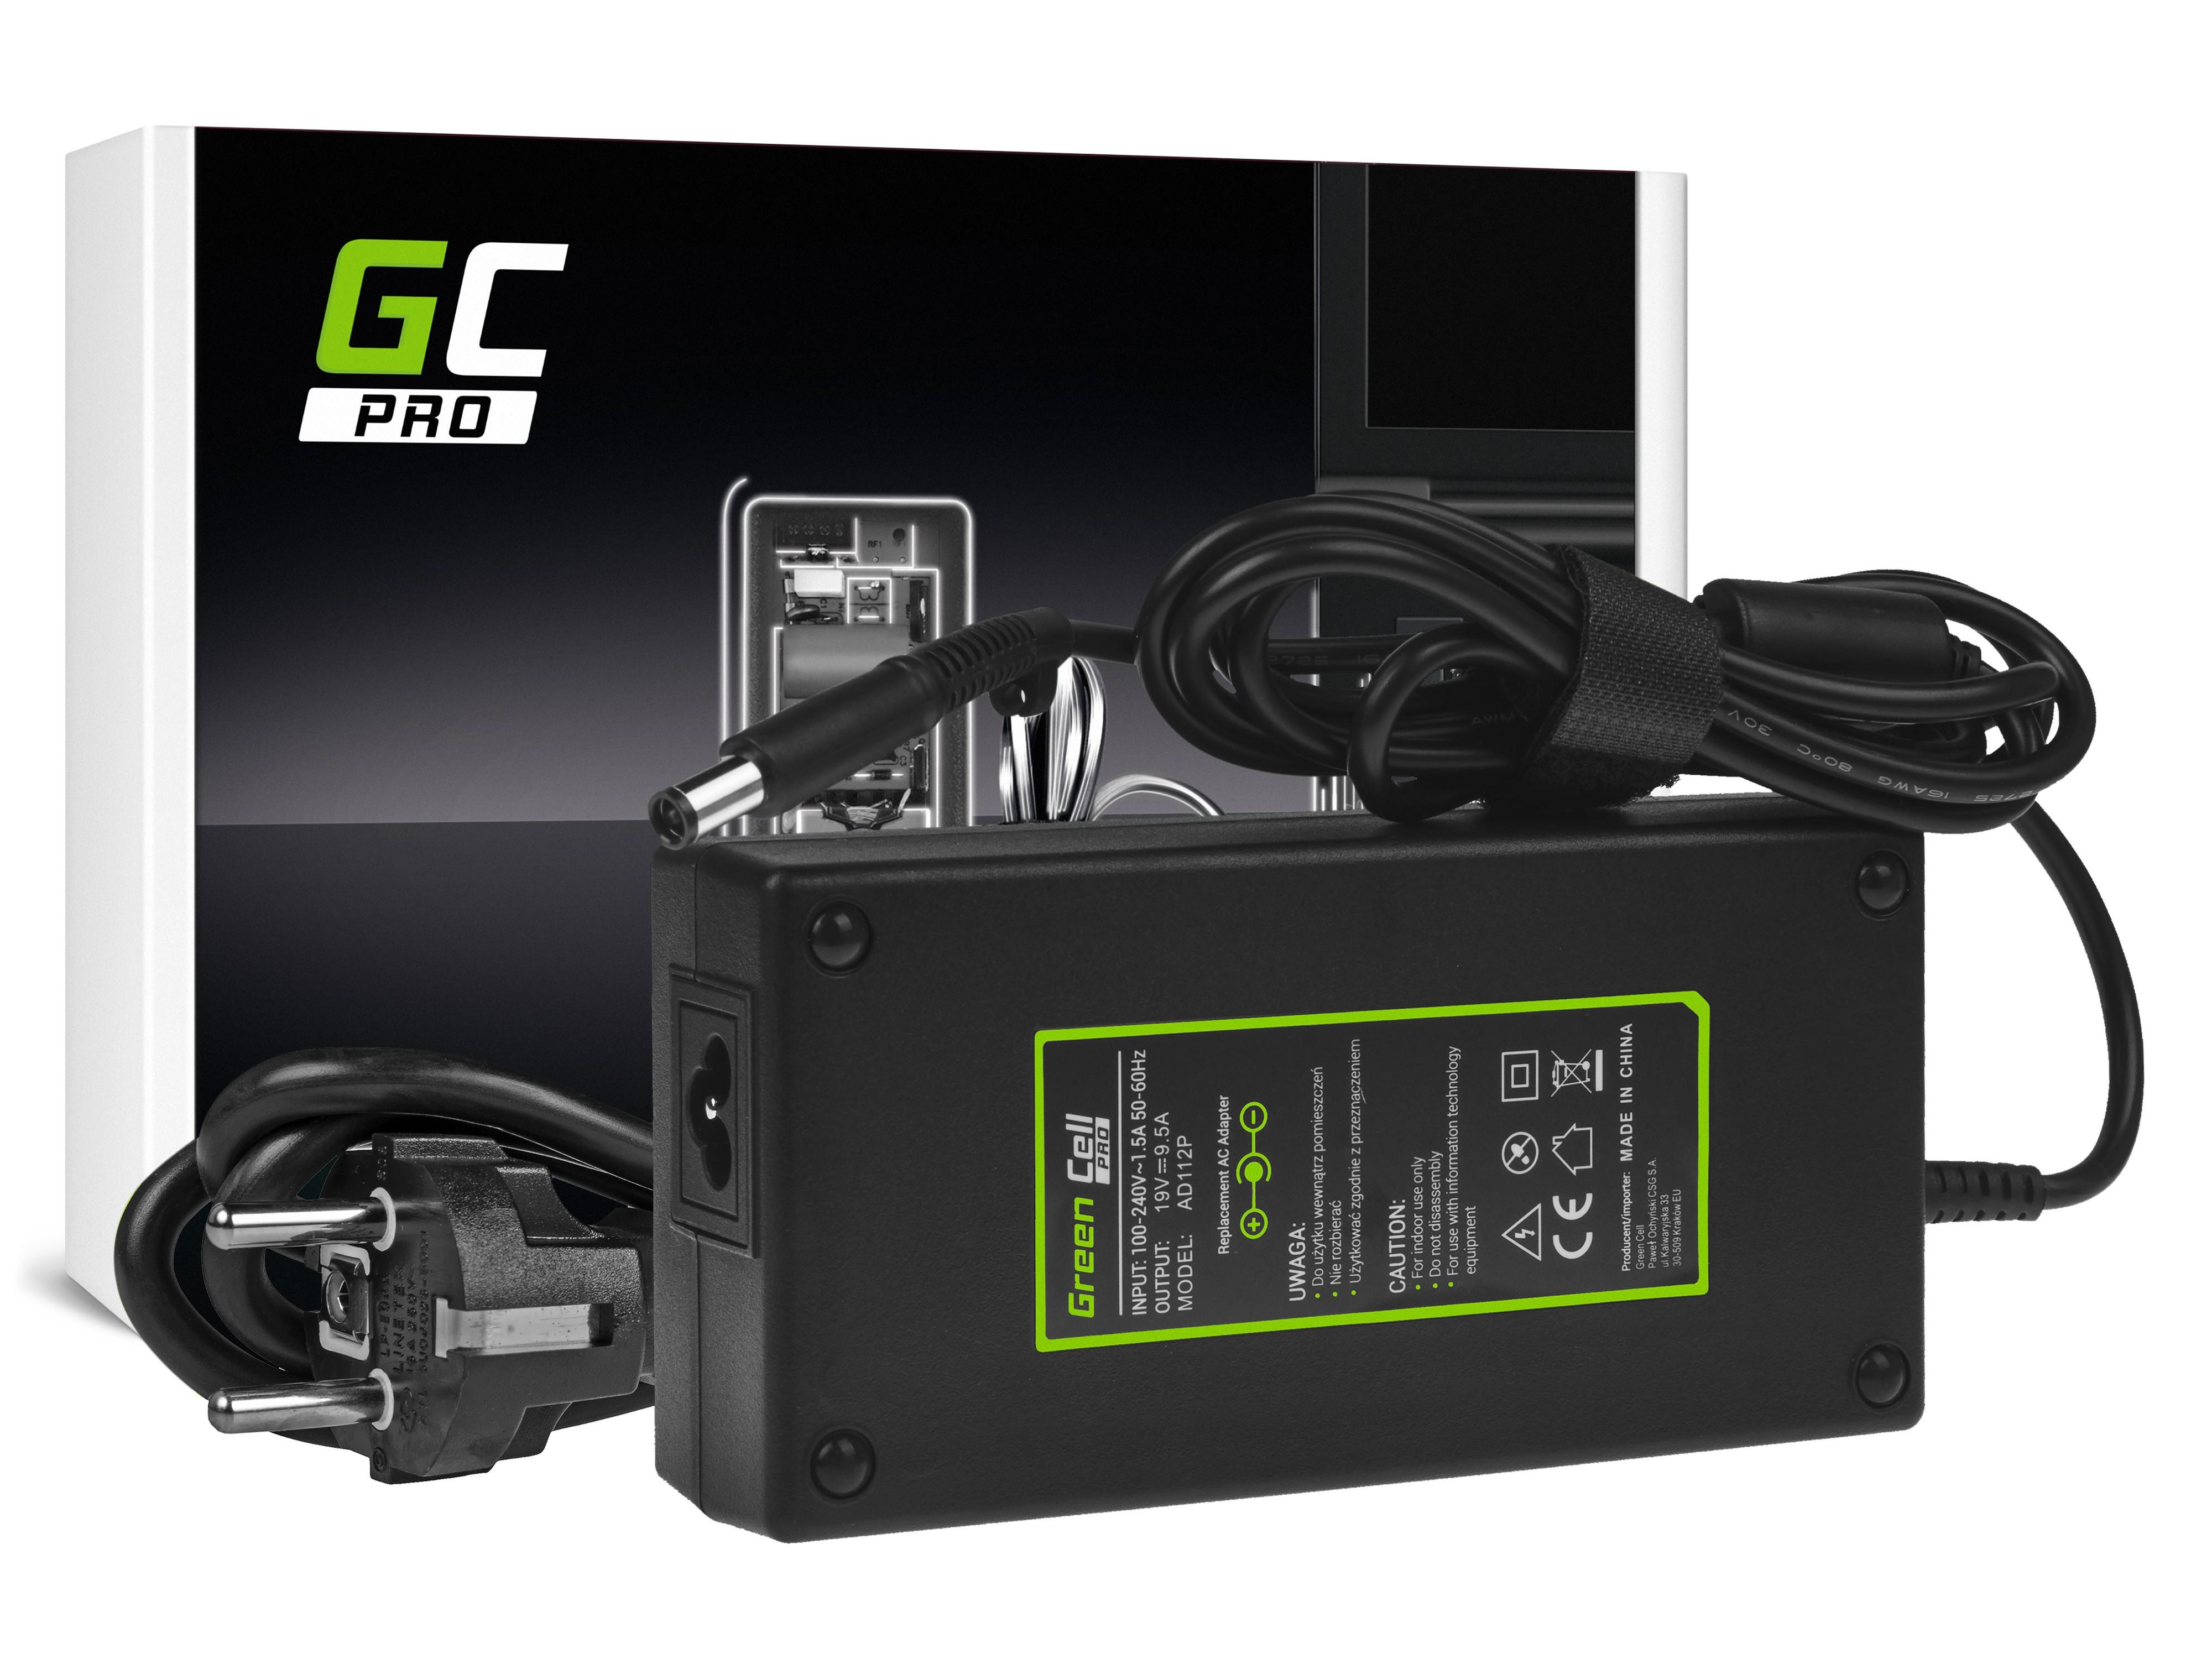 Zasilacz Ładowarka PRO 19V 9.5A 180W do HP Omni 200 220 HP TouchSmart 420 520 610 HP Elite 8200 8300